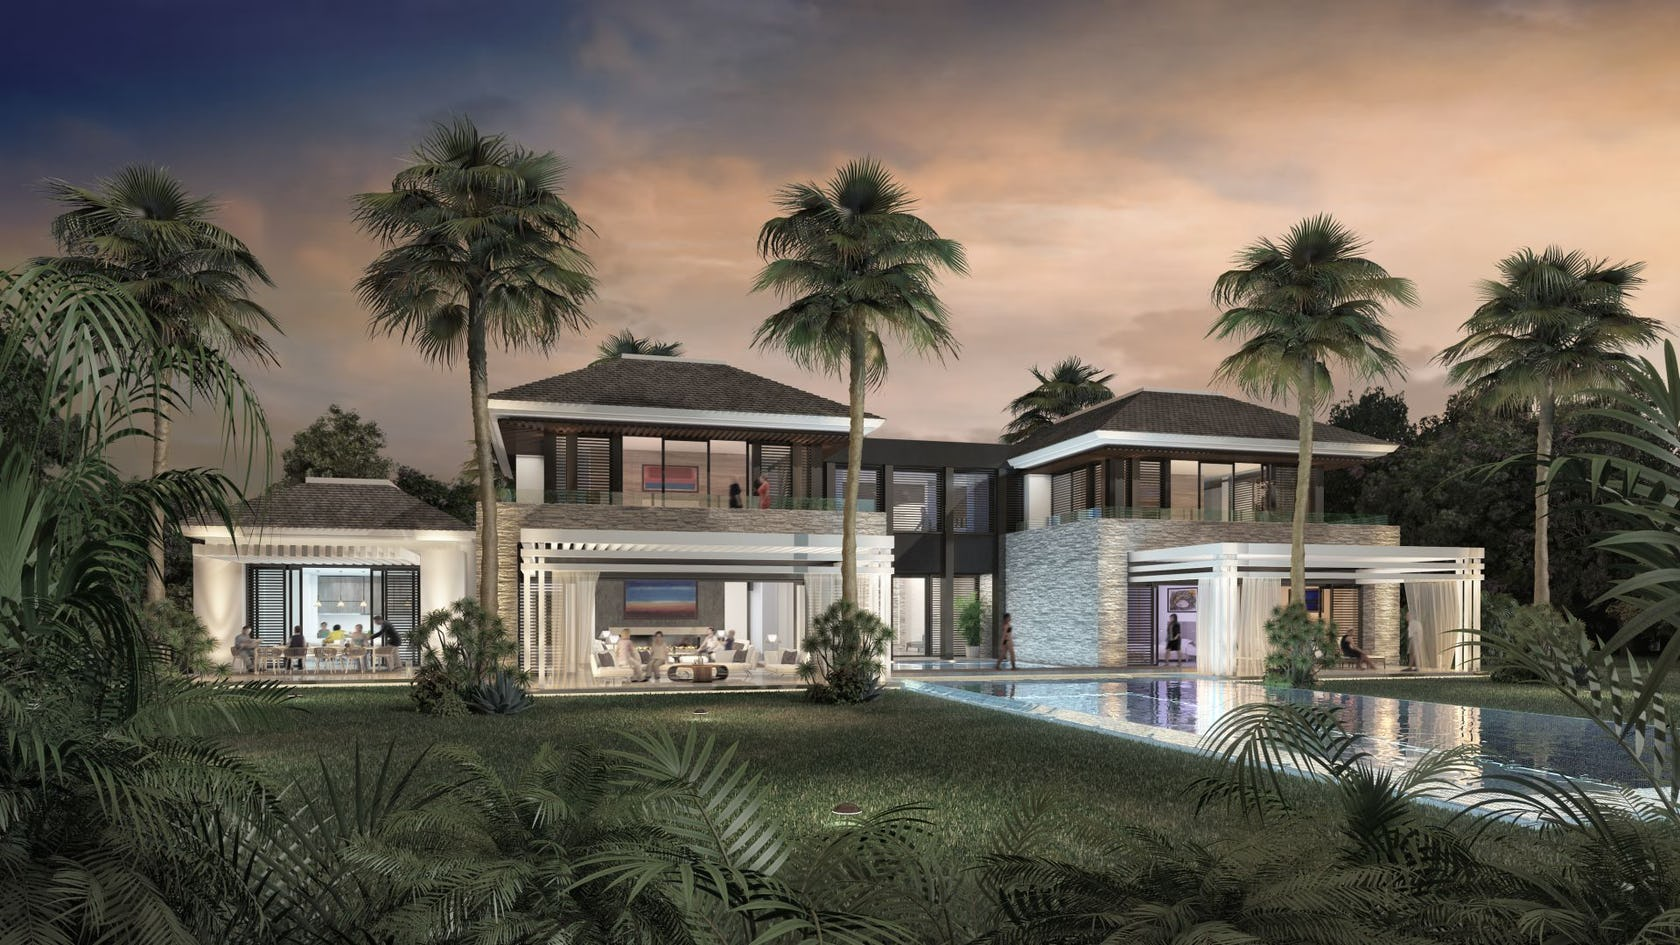 villa housing building house mansion palm tree arecaceae tree plant